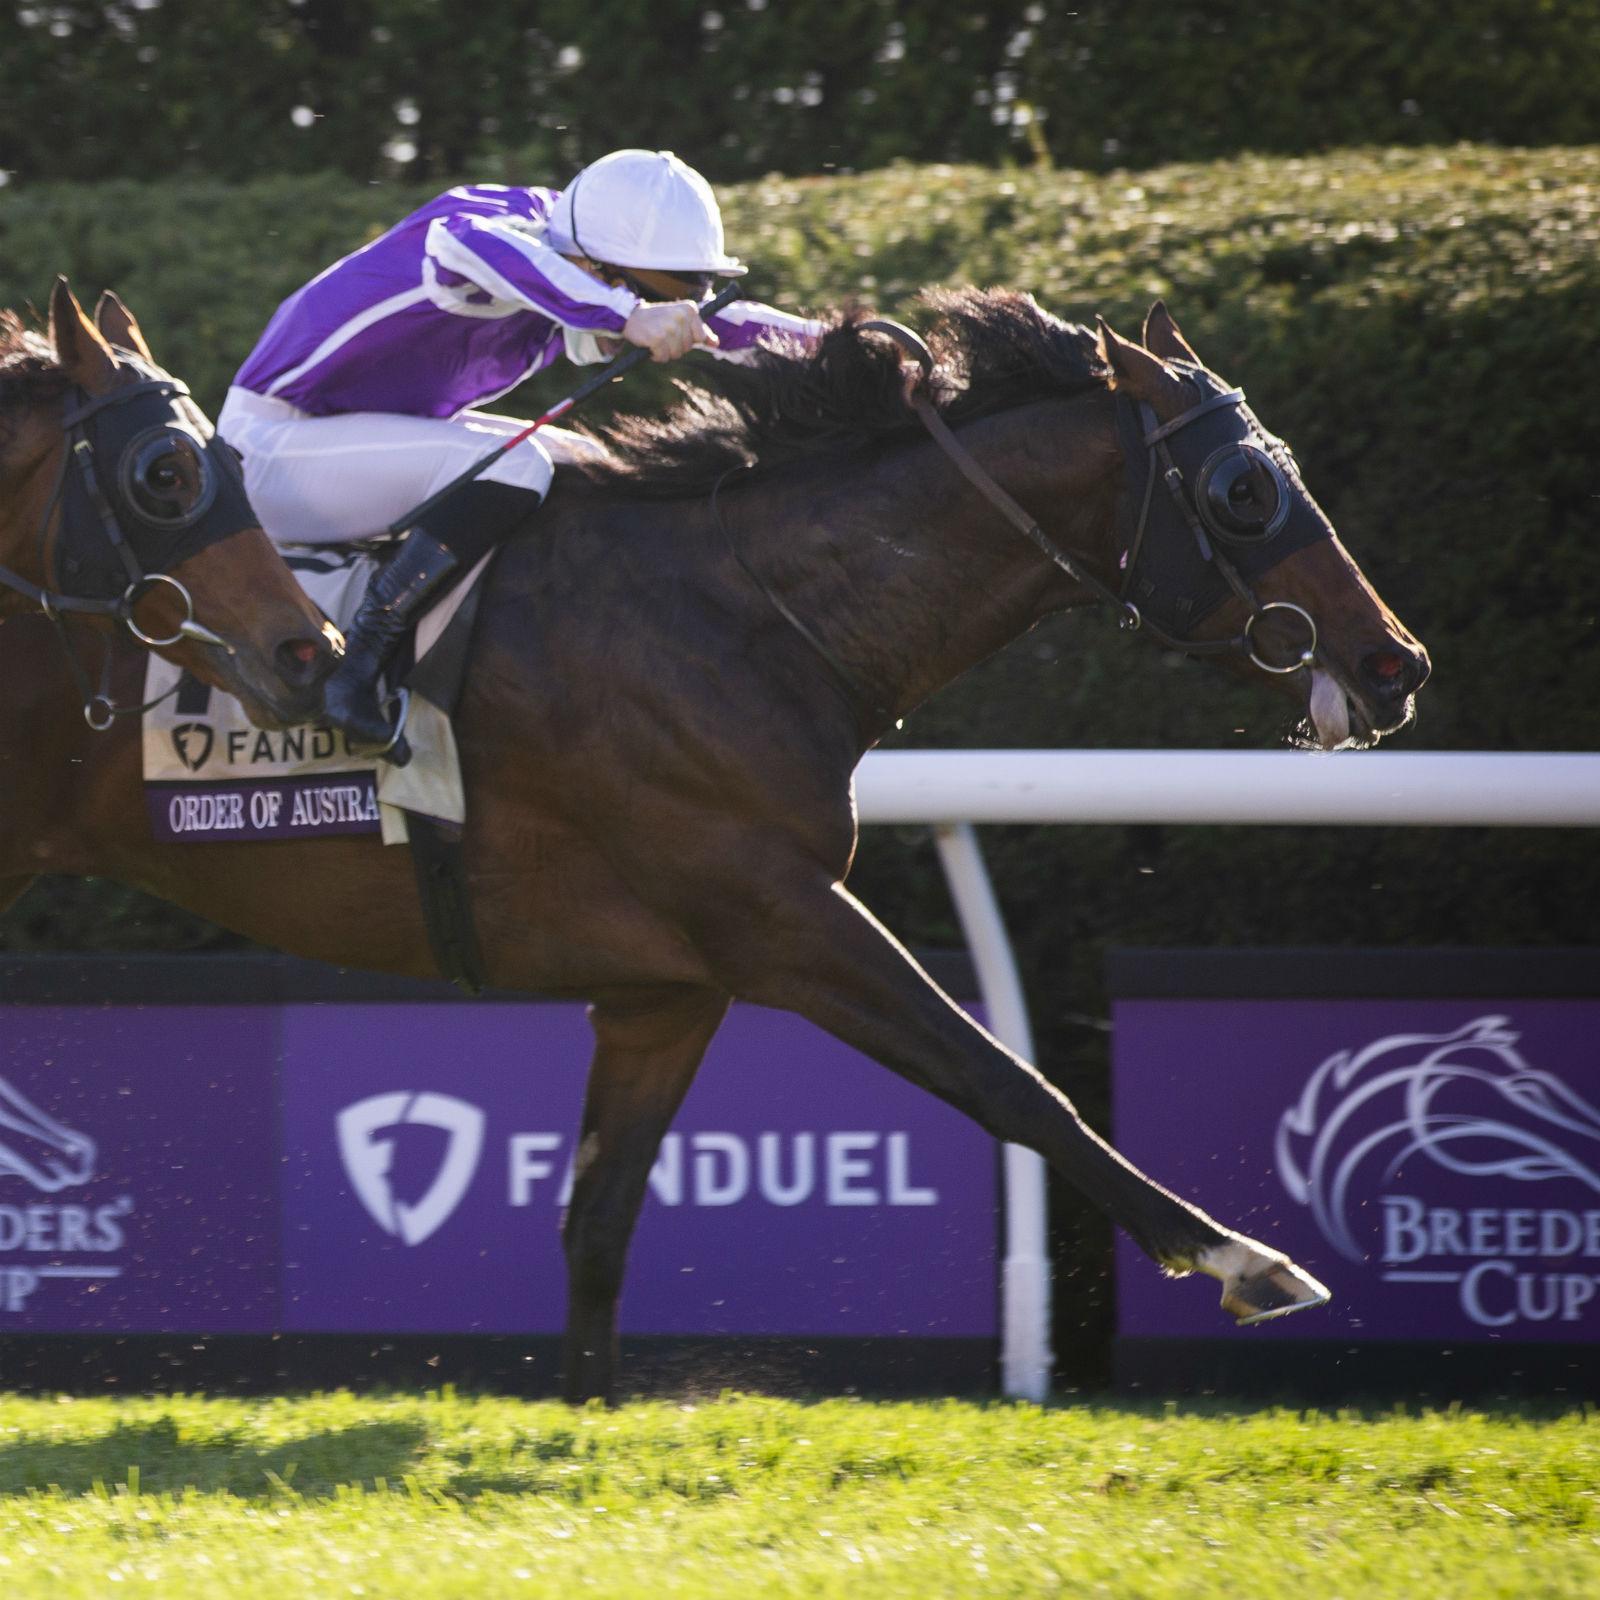 Horse betting online in illinois granada vs bilbao betting tips